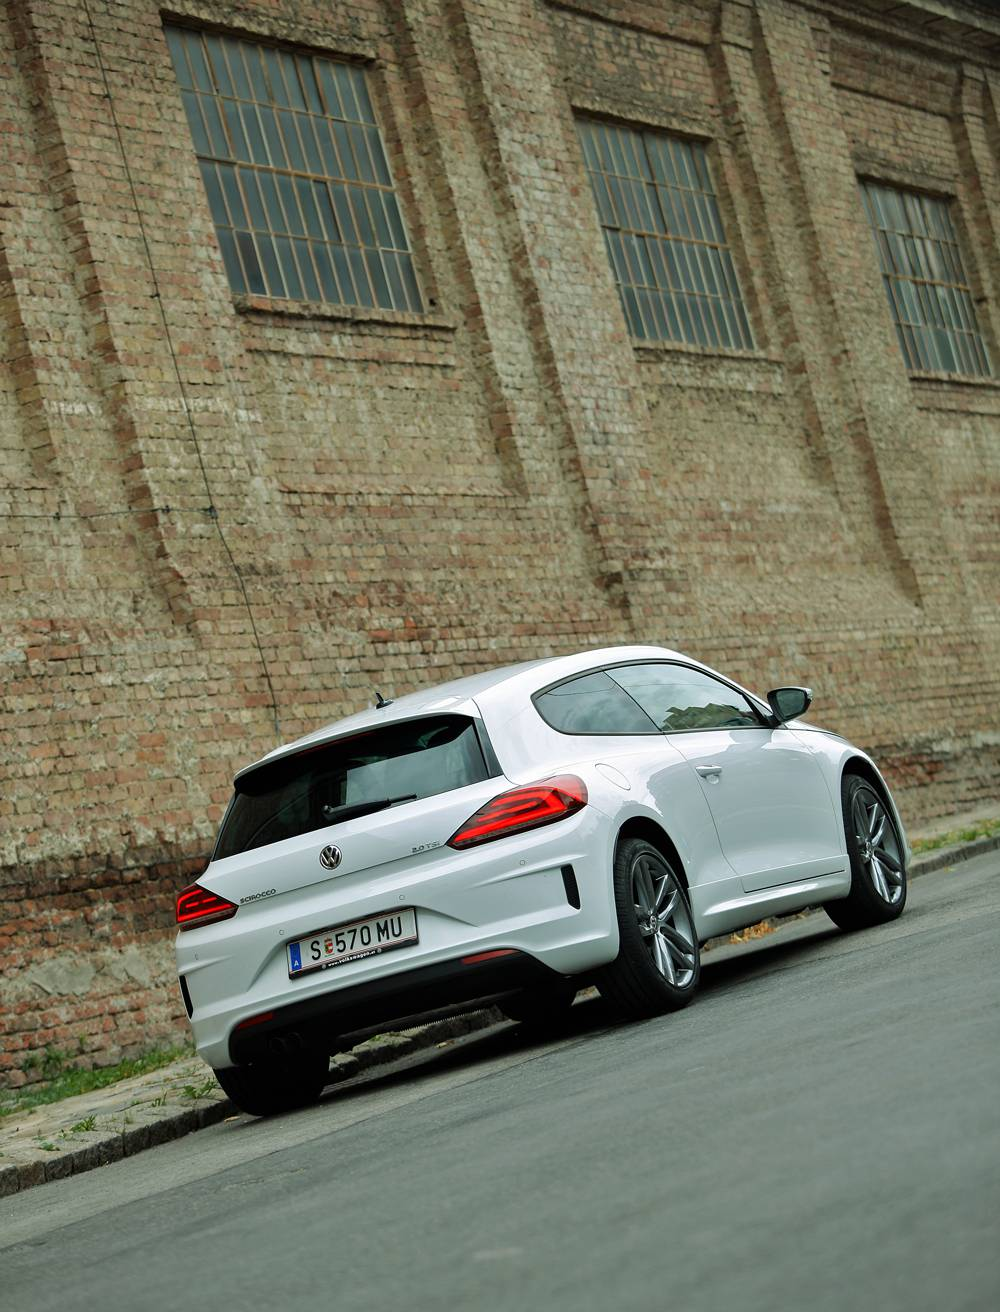 _VW-Scirocco-sport-tsi-dsg-riedmann-3